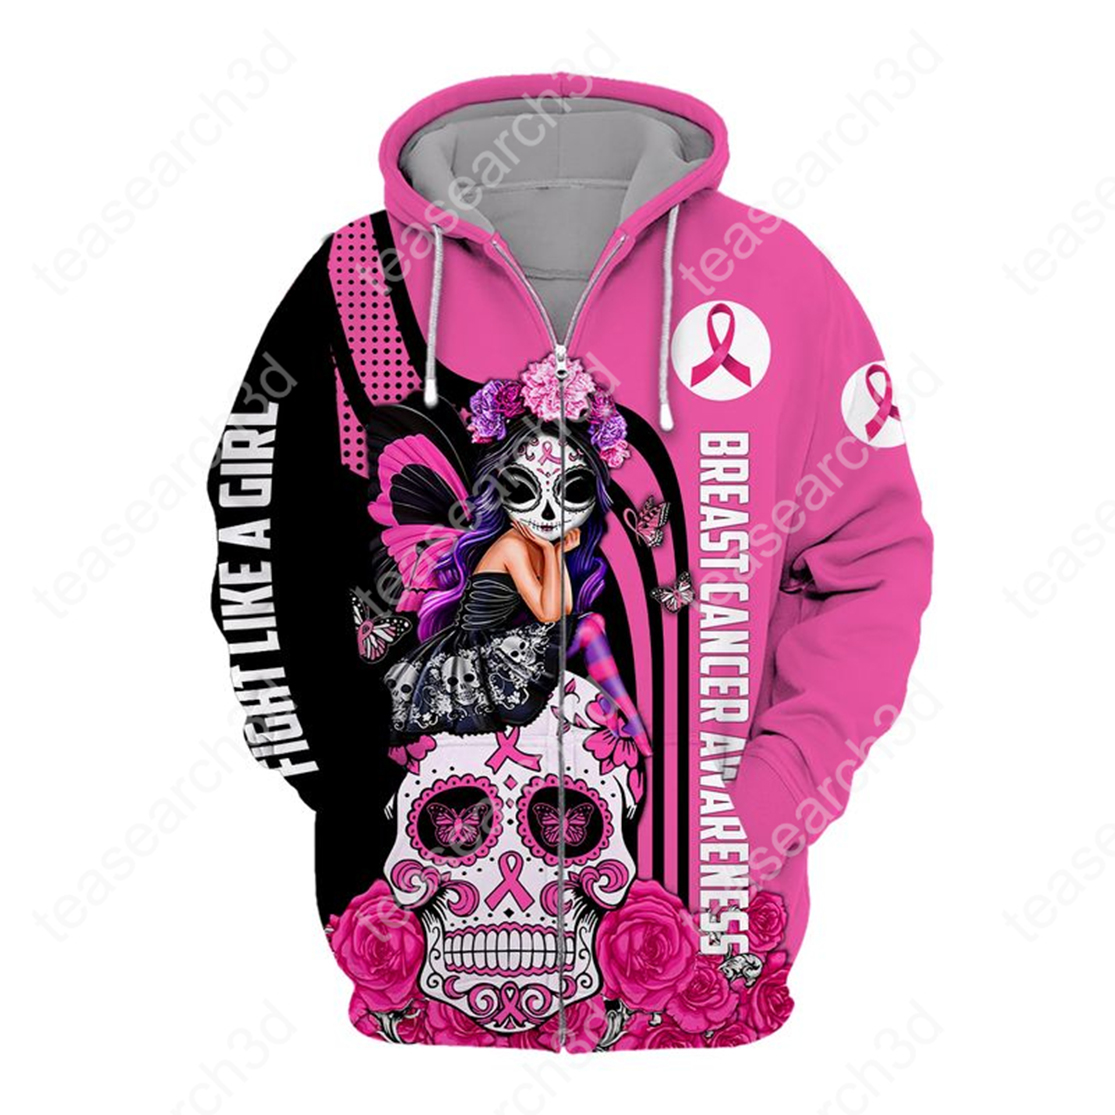 Breast cancer awareness Fight like a girl sugar skull fairy 3d zip hoodie